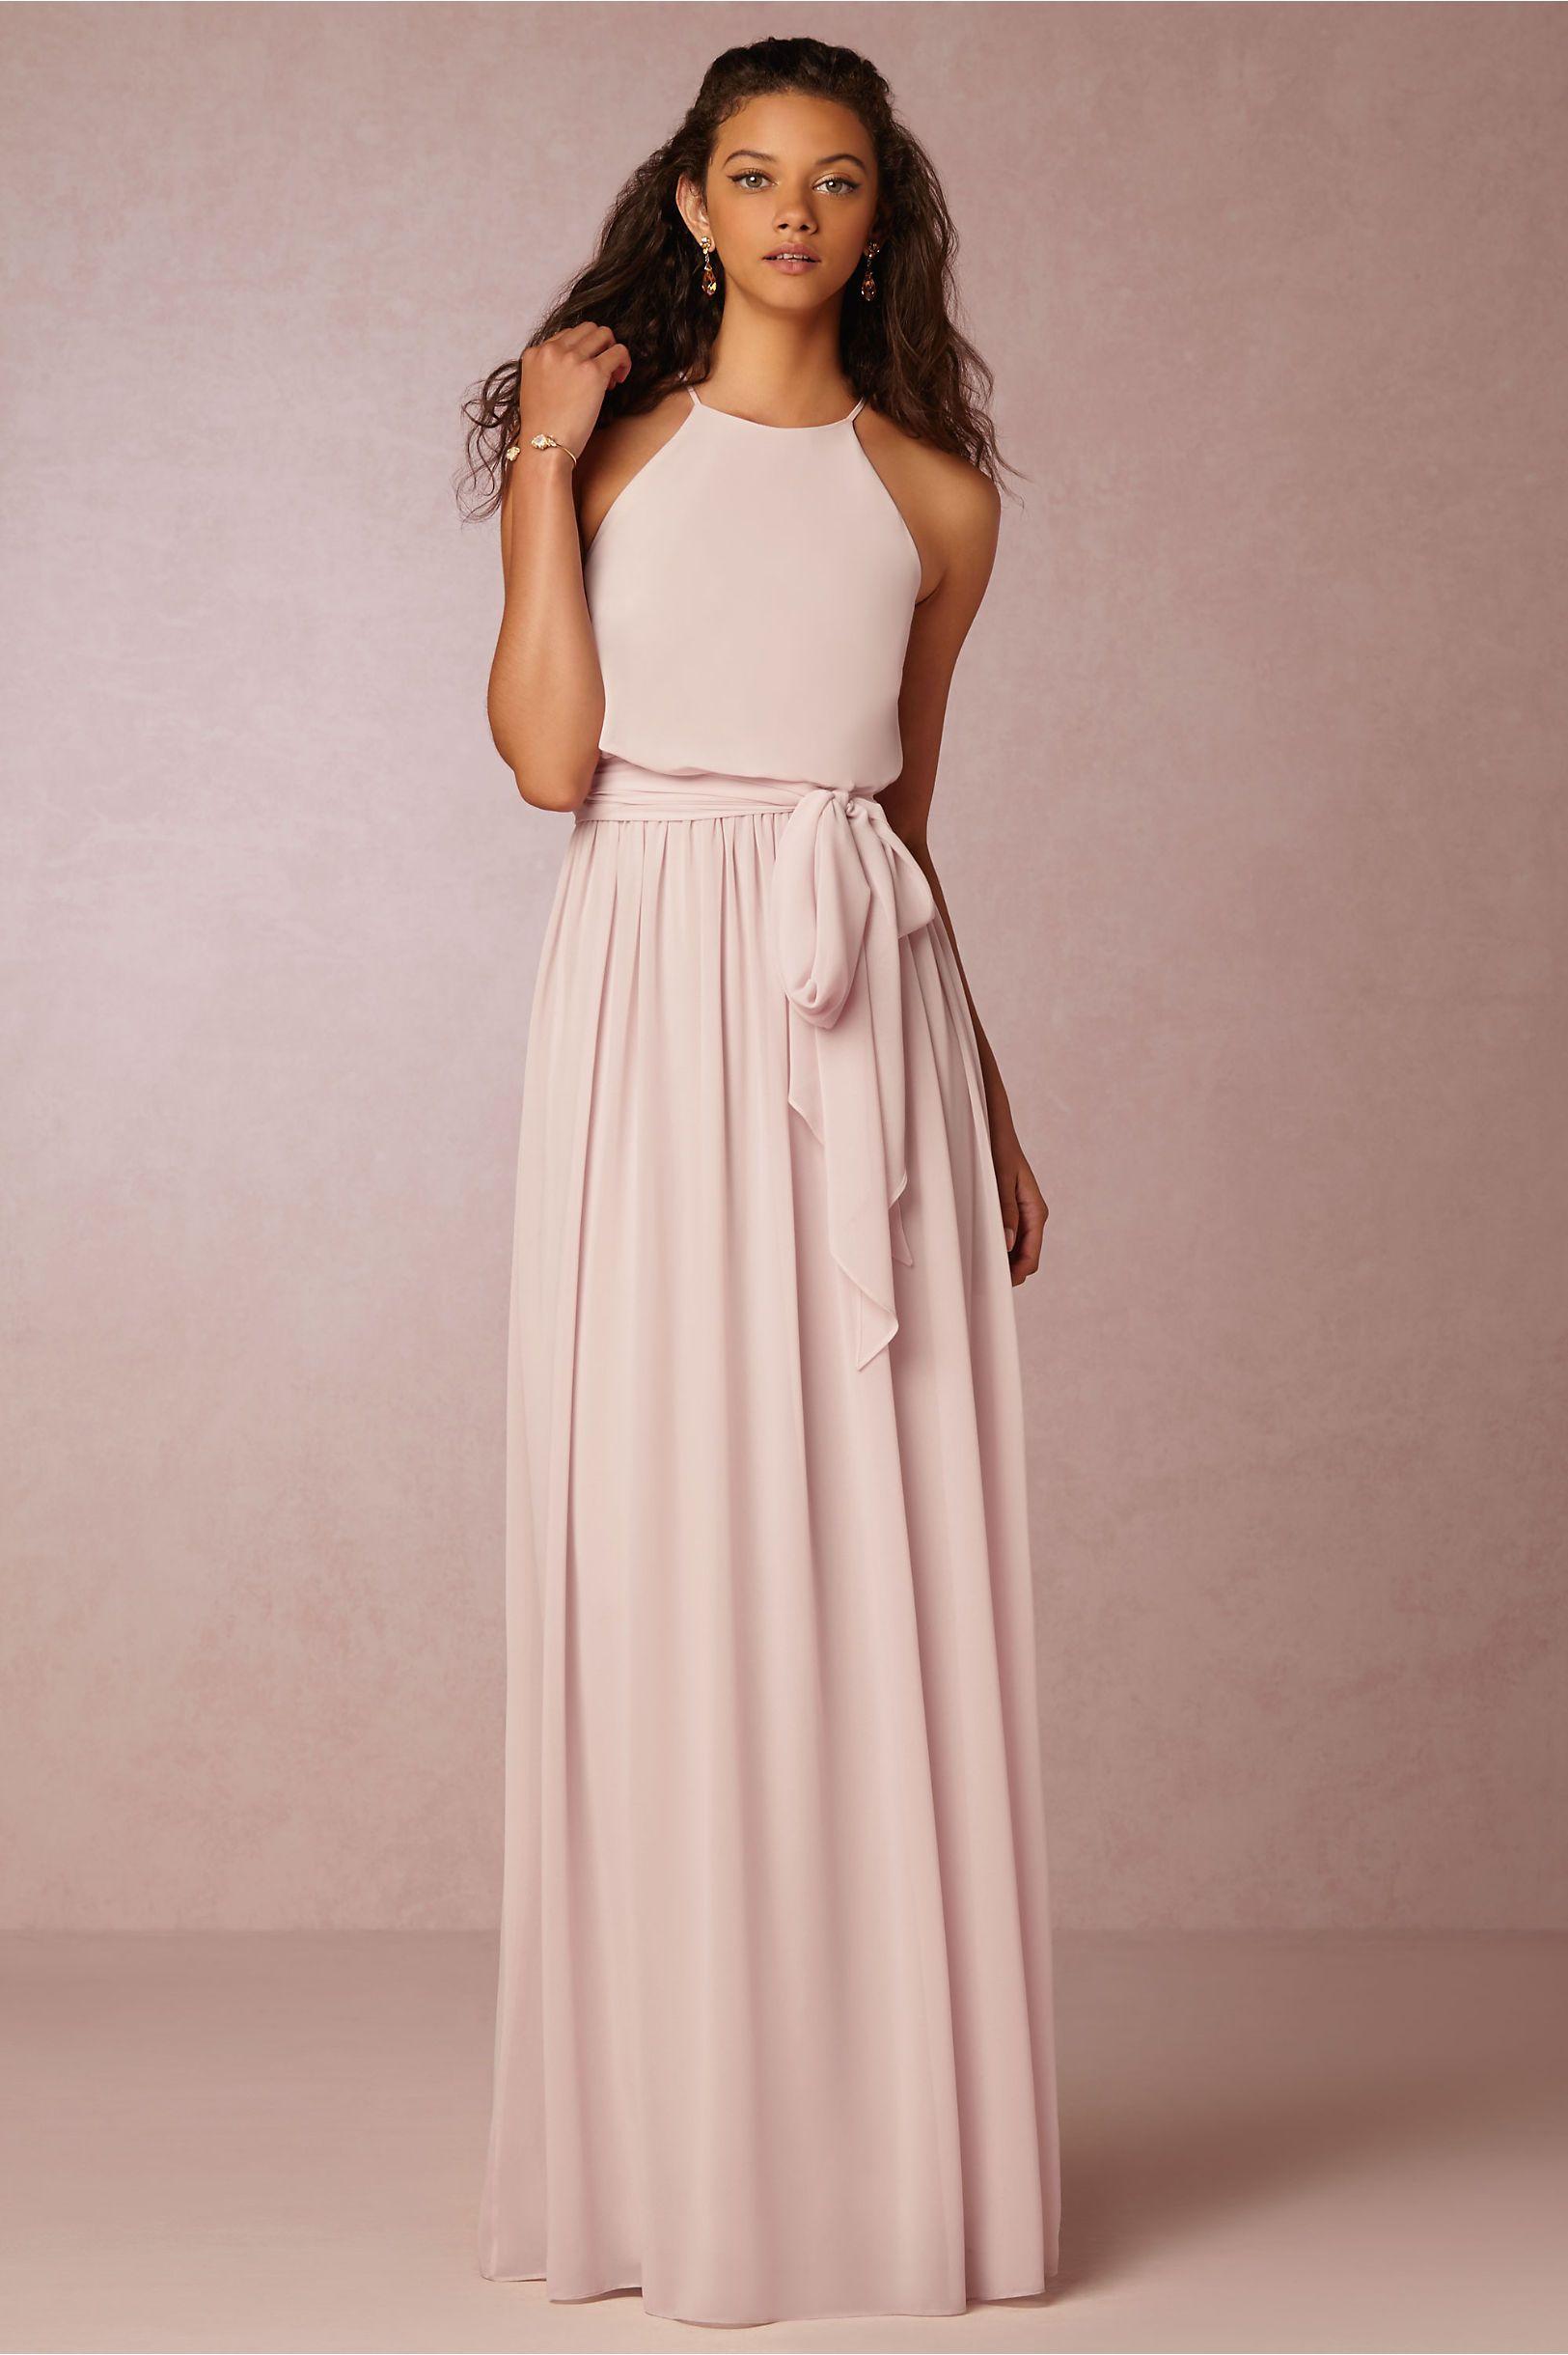 BHLDN Alana Dress in Bridesmaids Bridesmaid Dresses at BHLDN ...